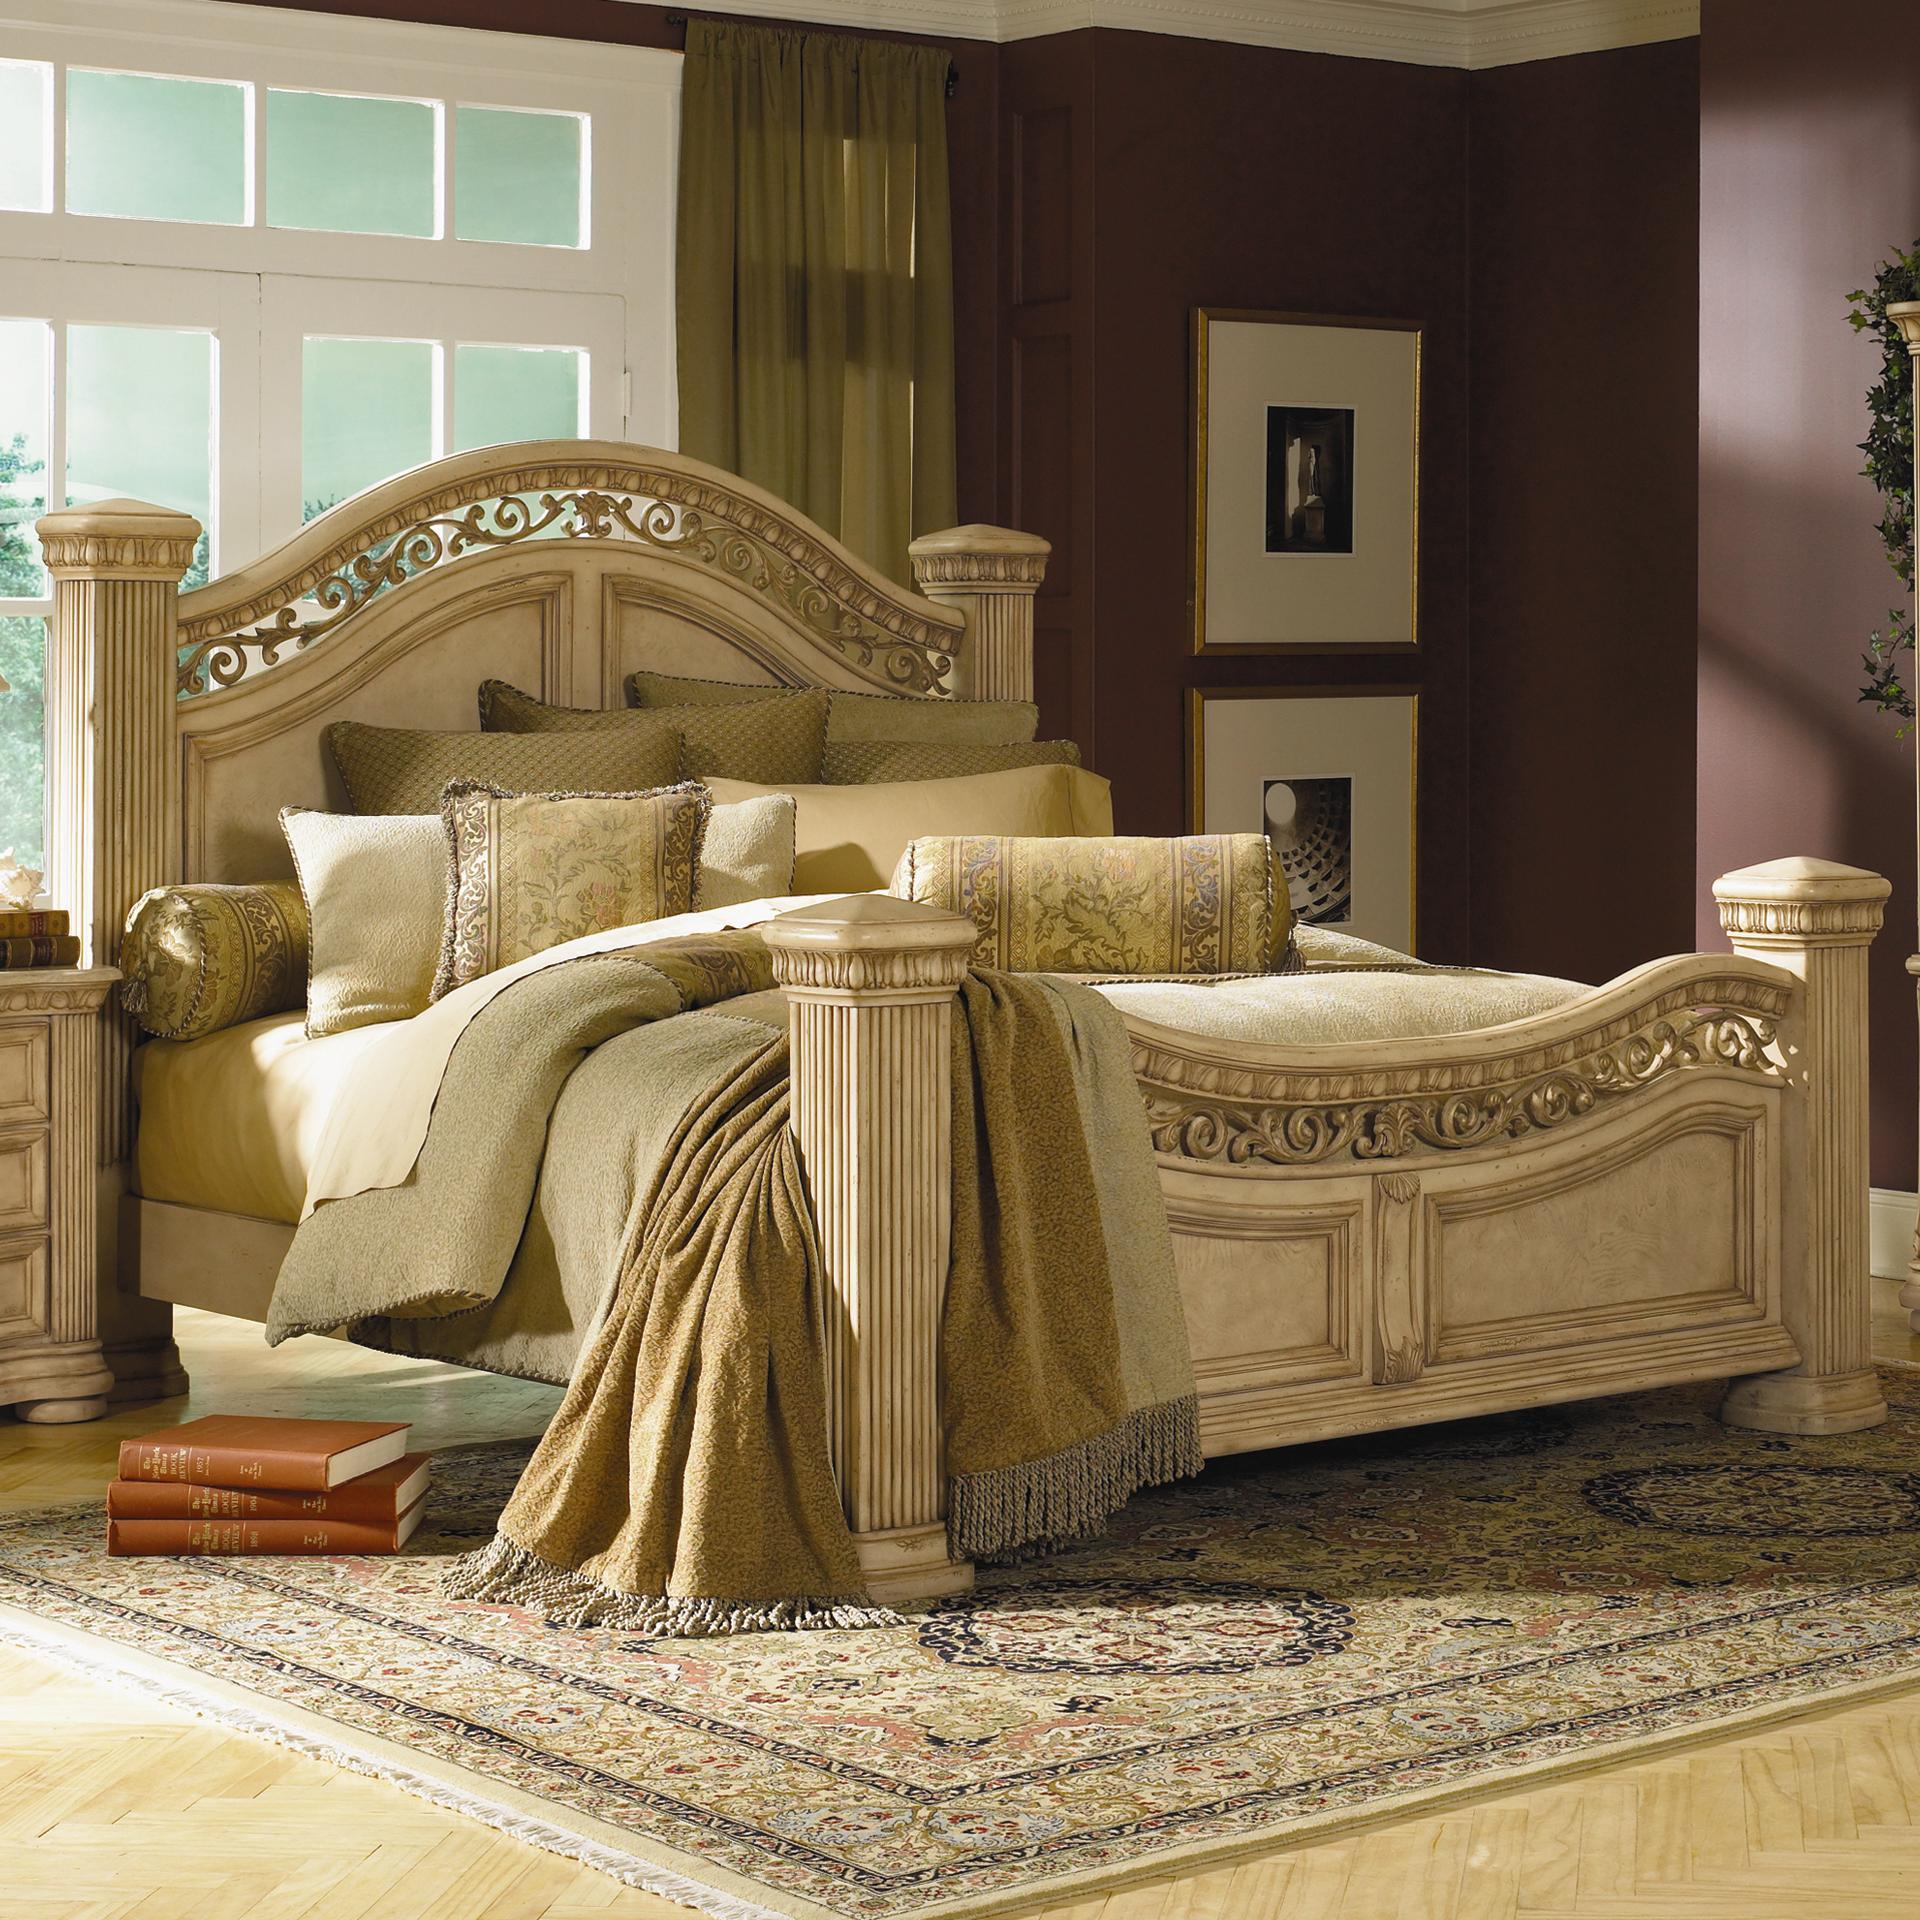 Delicieux Flexsteel Wynwood Collection Antiguo Blanco King Mansion Bed   AHFA    Headboard U0026 Footboard Dealer Locator